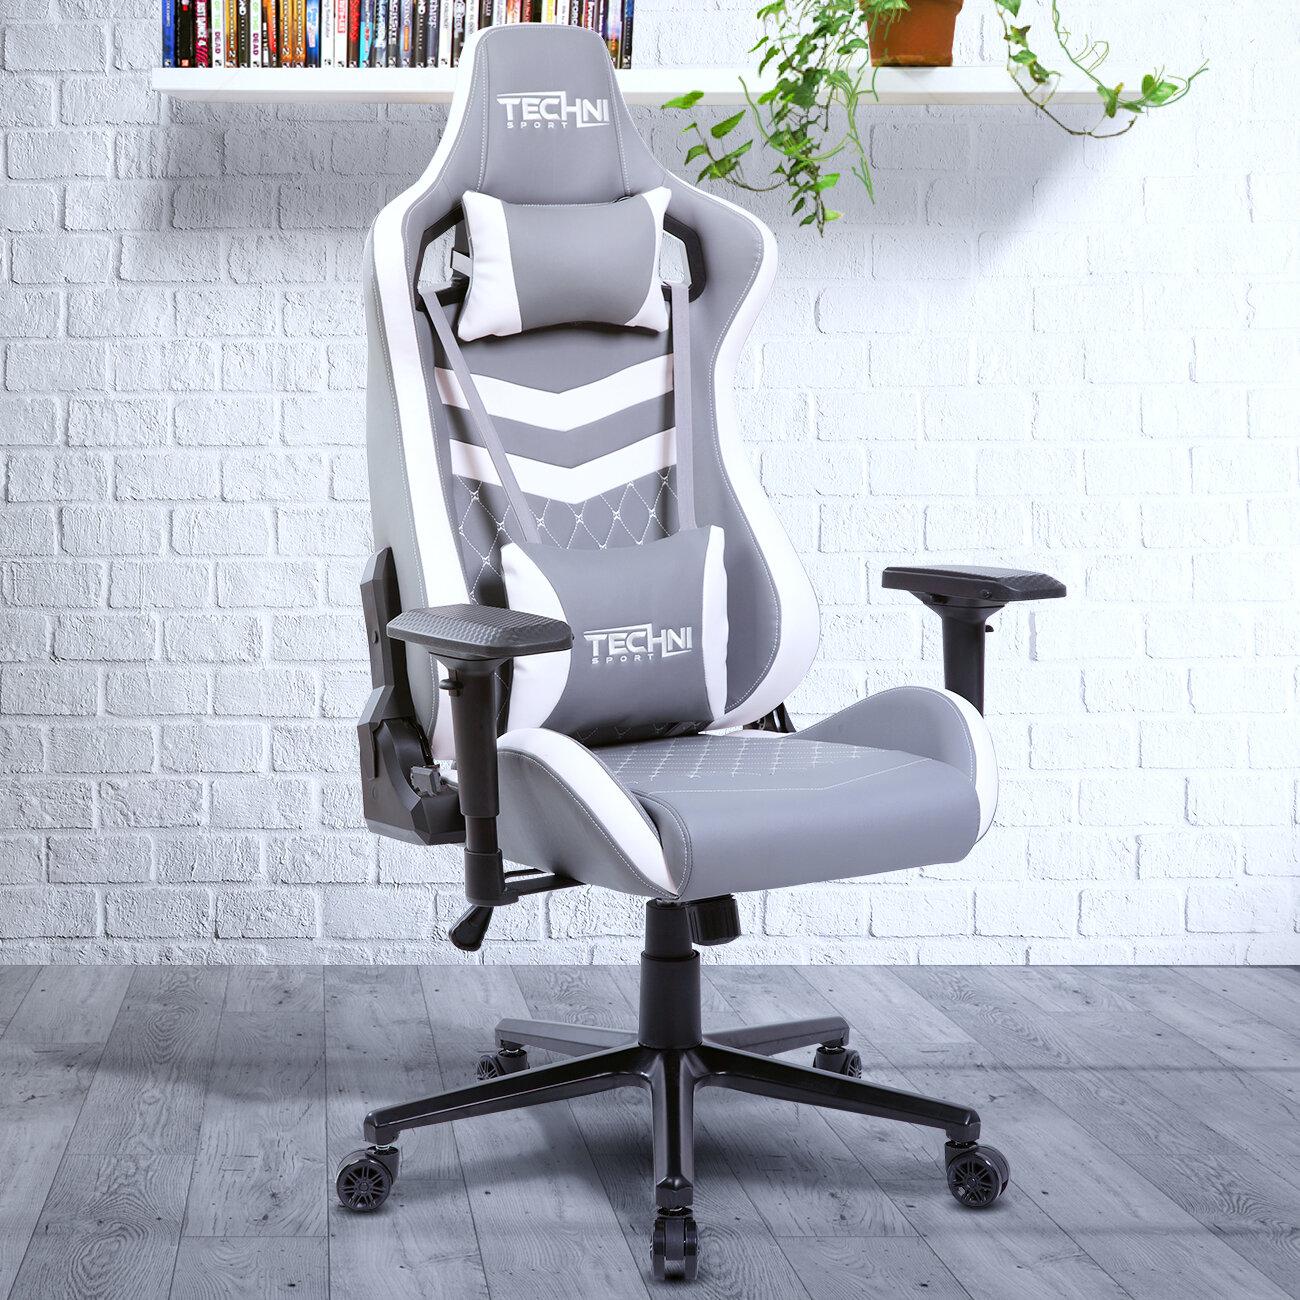 Cool Techni Sport Ergonomic High Back Gaming Chair Reviews Lamtechconsult Wood Chair Design Ideas Lamtechconsultcom